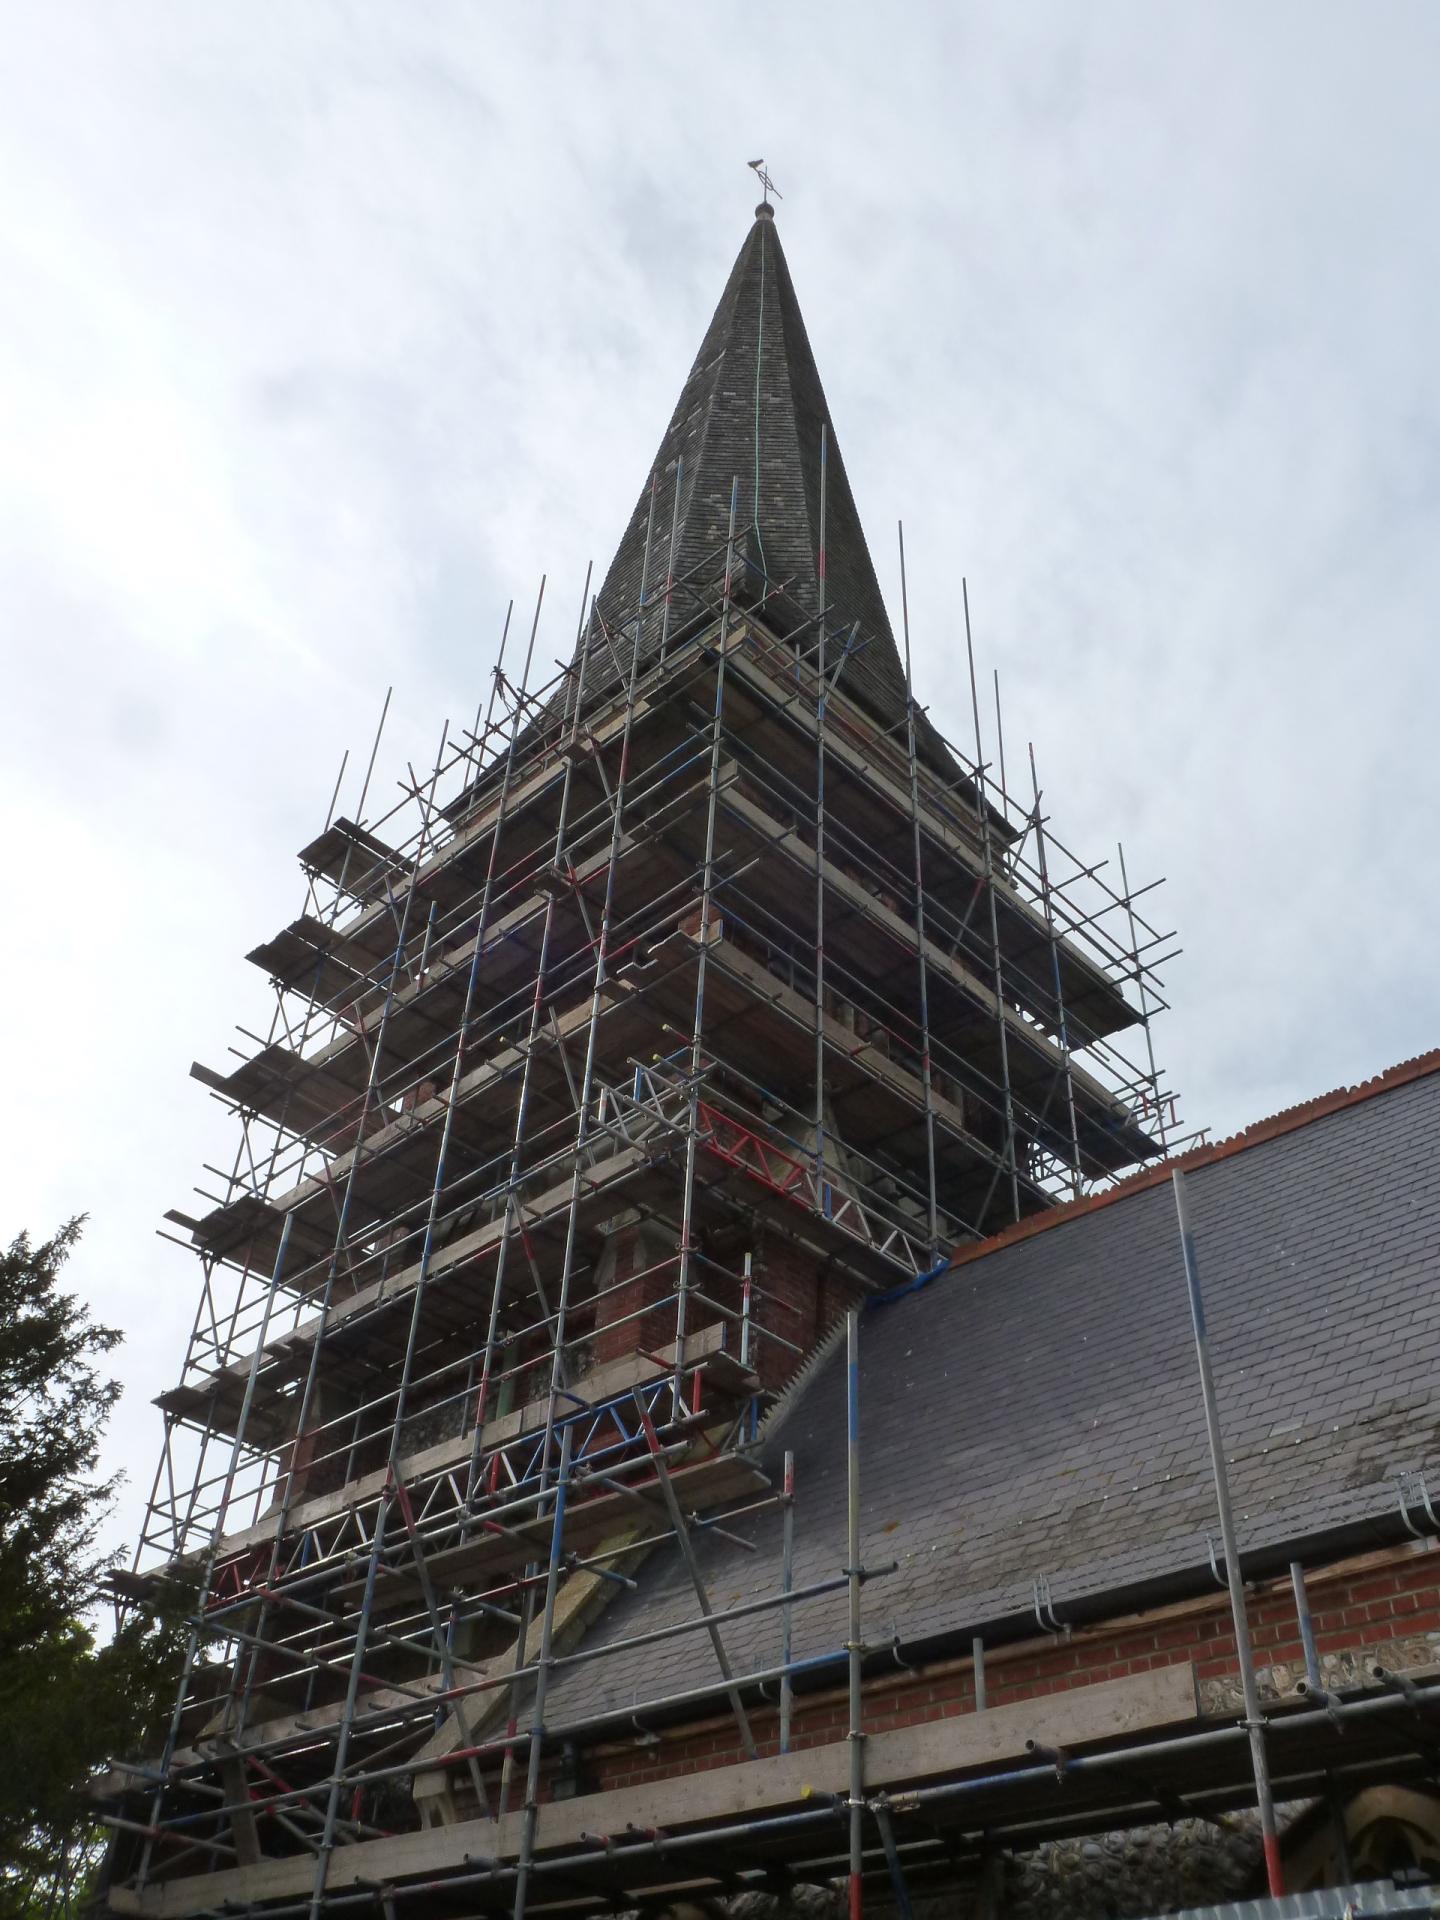 St. Botolph's, Heene, scaffolding, 19.6.16